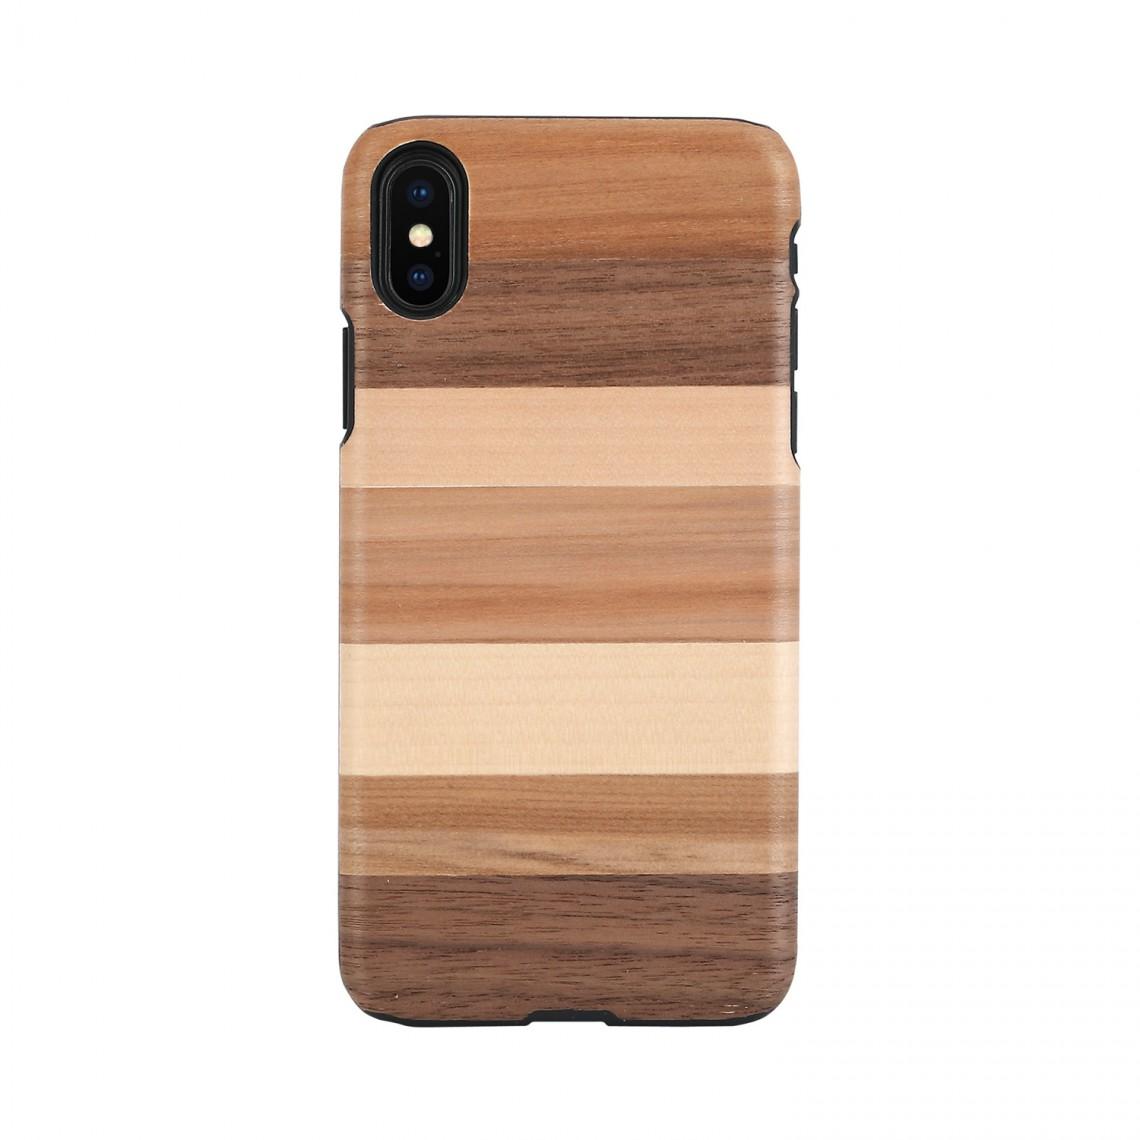 iPhone XR ケース 天然木 Man&Wood Sabbia(マンアンドウッド サッビア)